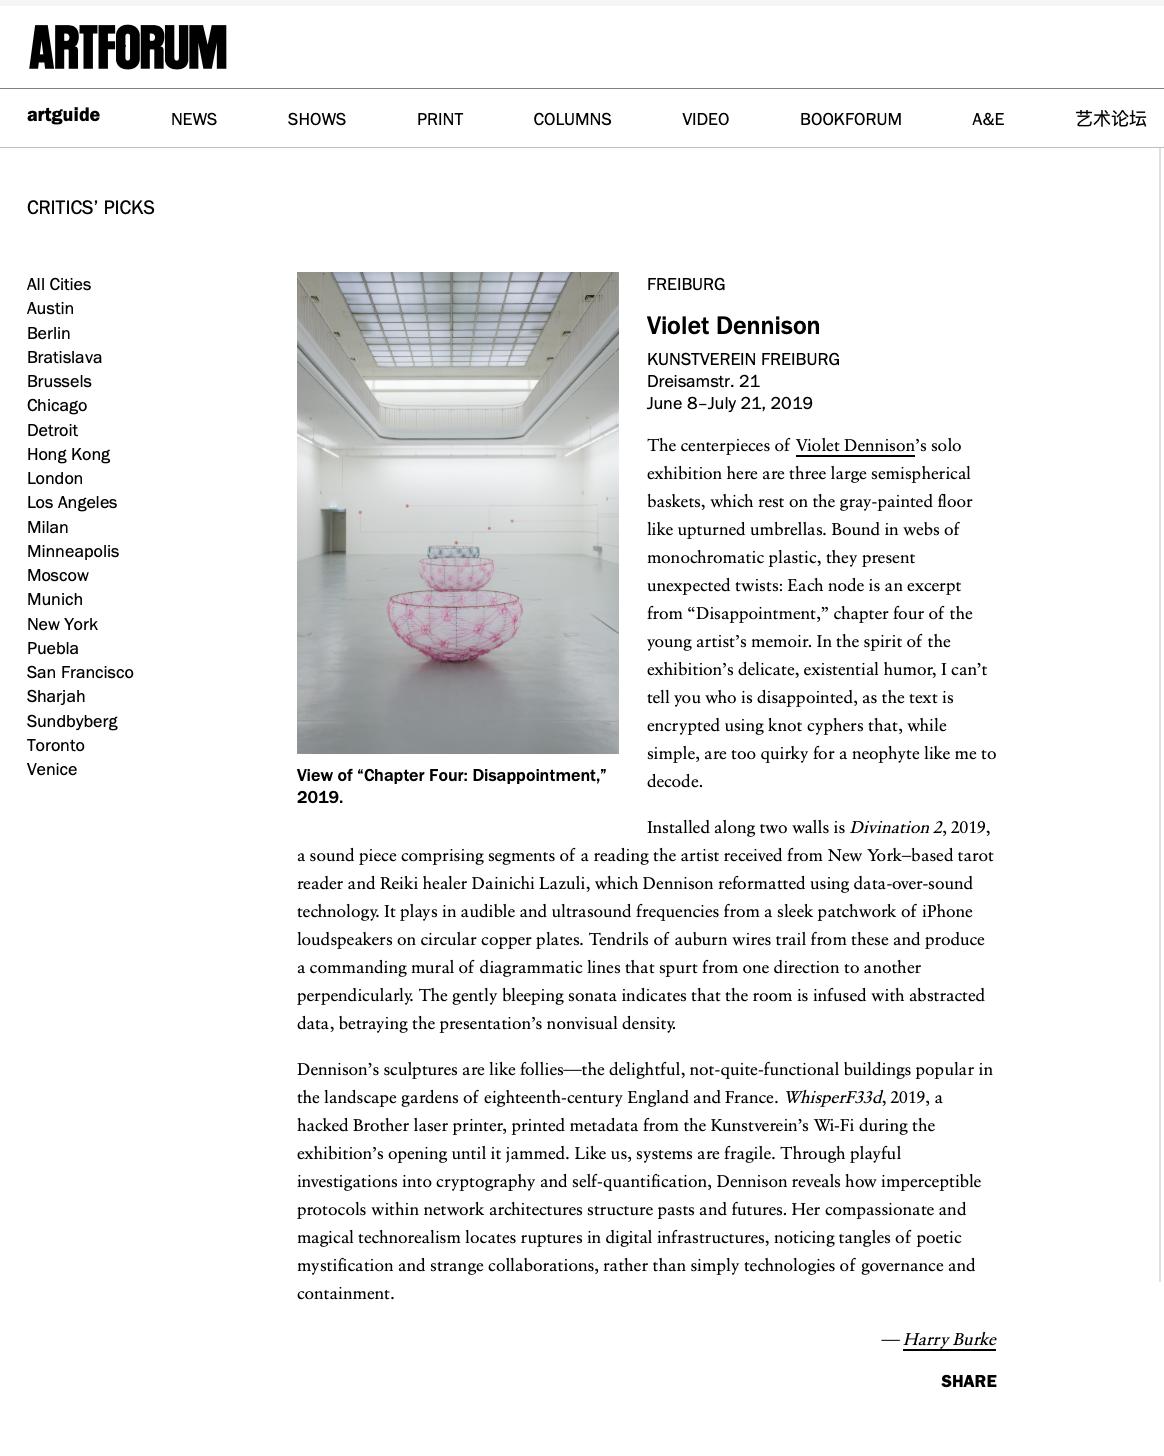 ArtForum_2019.png